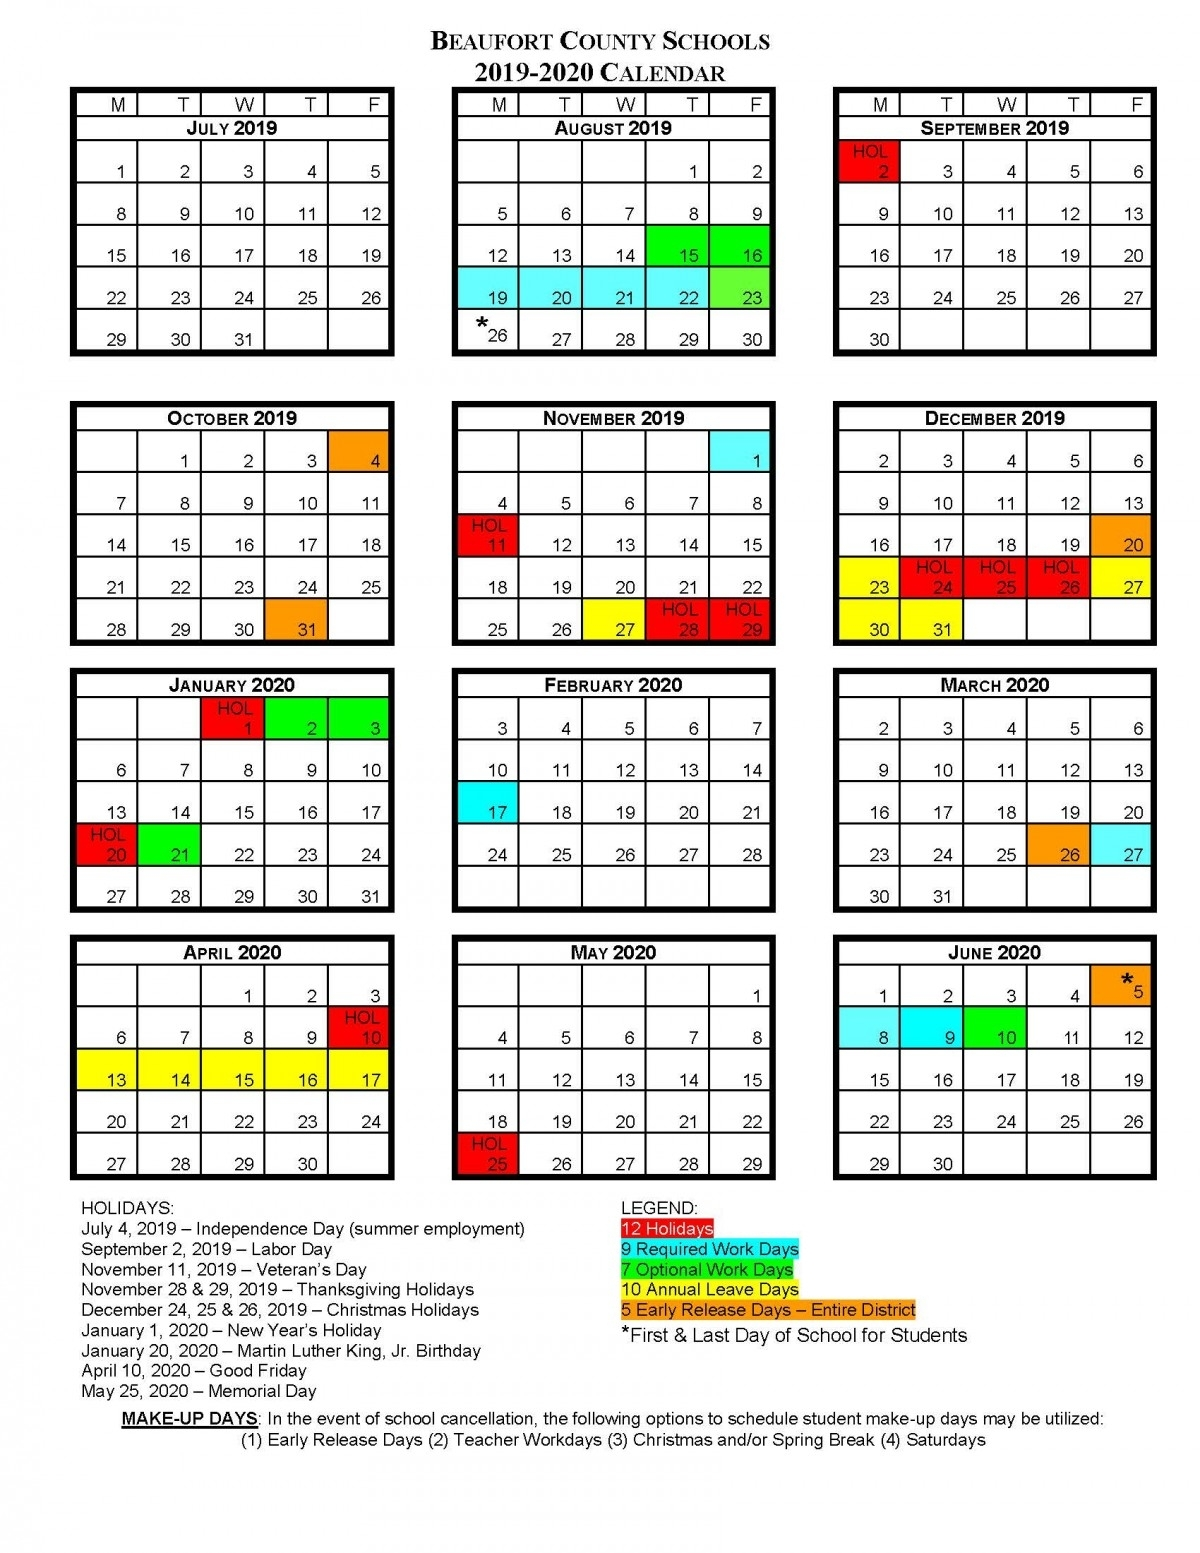 Bcs School Calendars | Beaufort County Schools